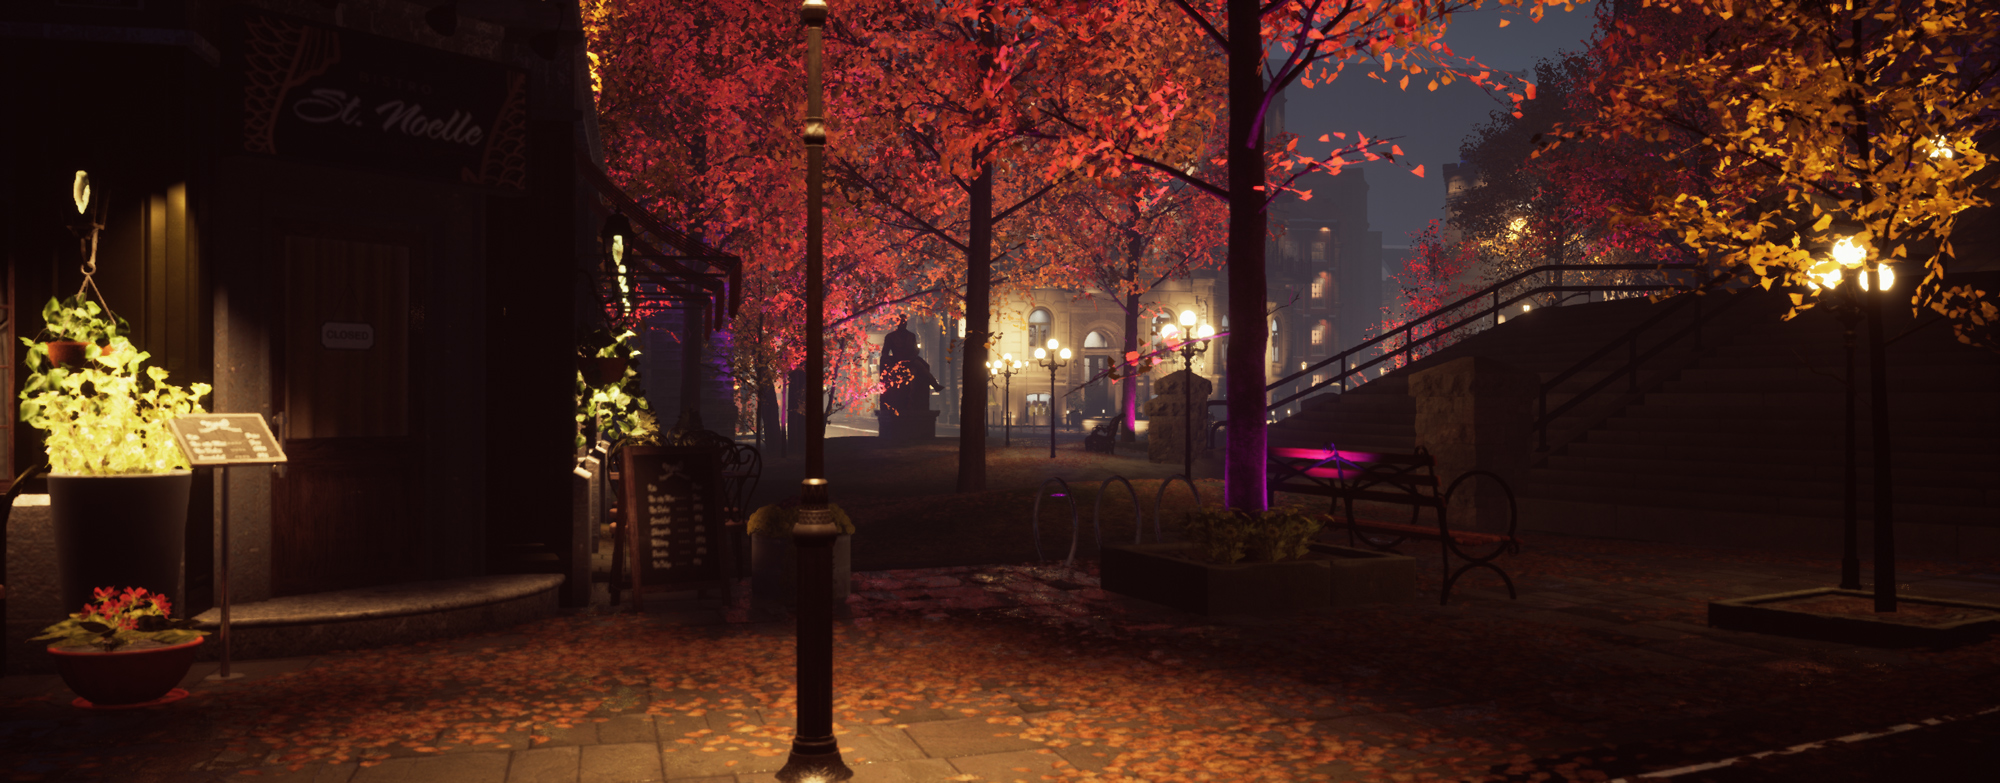 Londoner Night 6